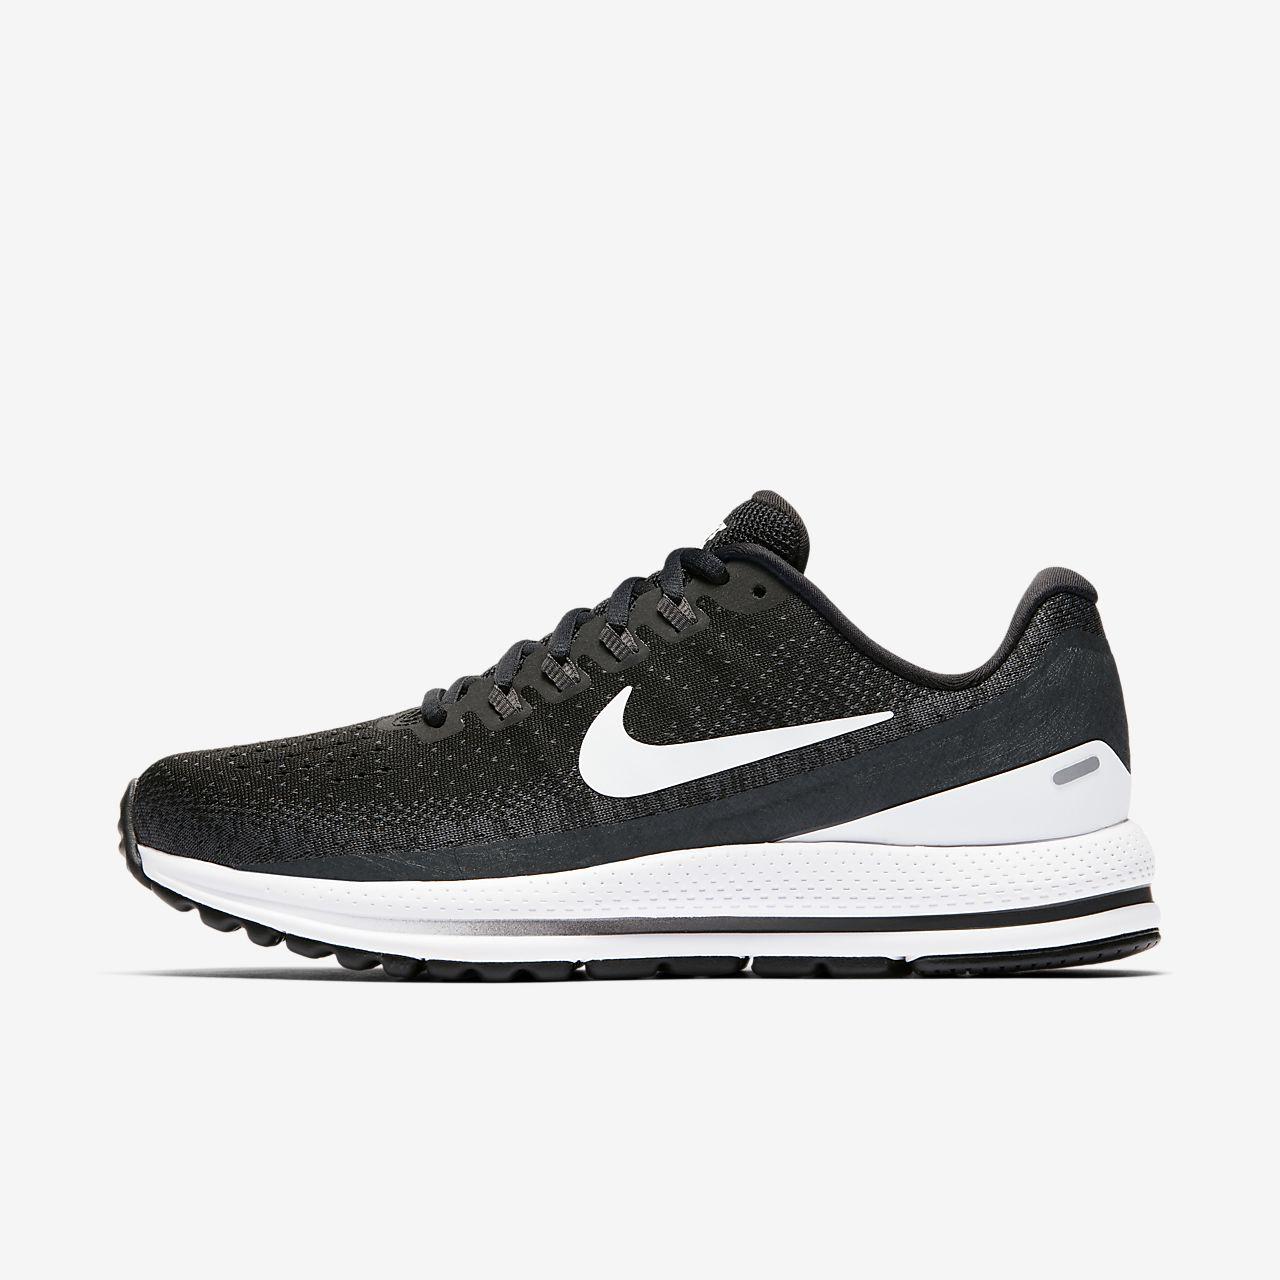 Calzado de running para mujer Nike Air Zoom Vomero 13